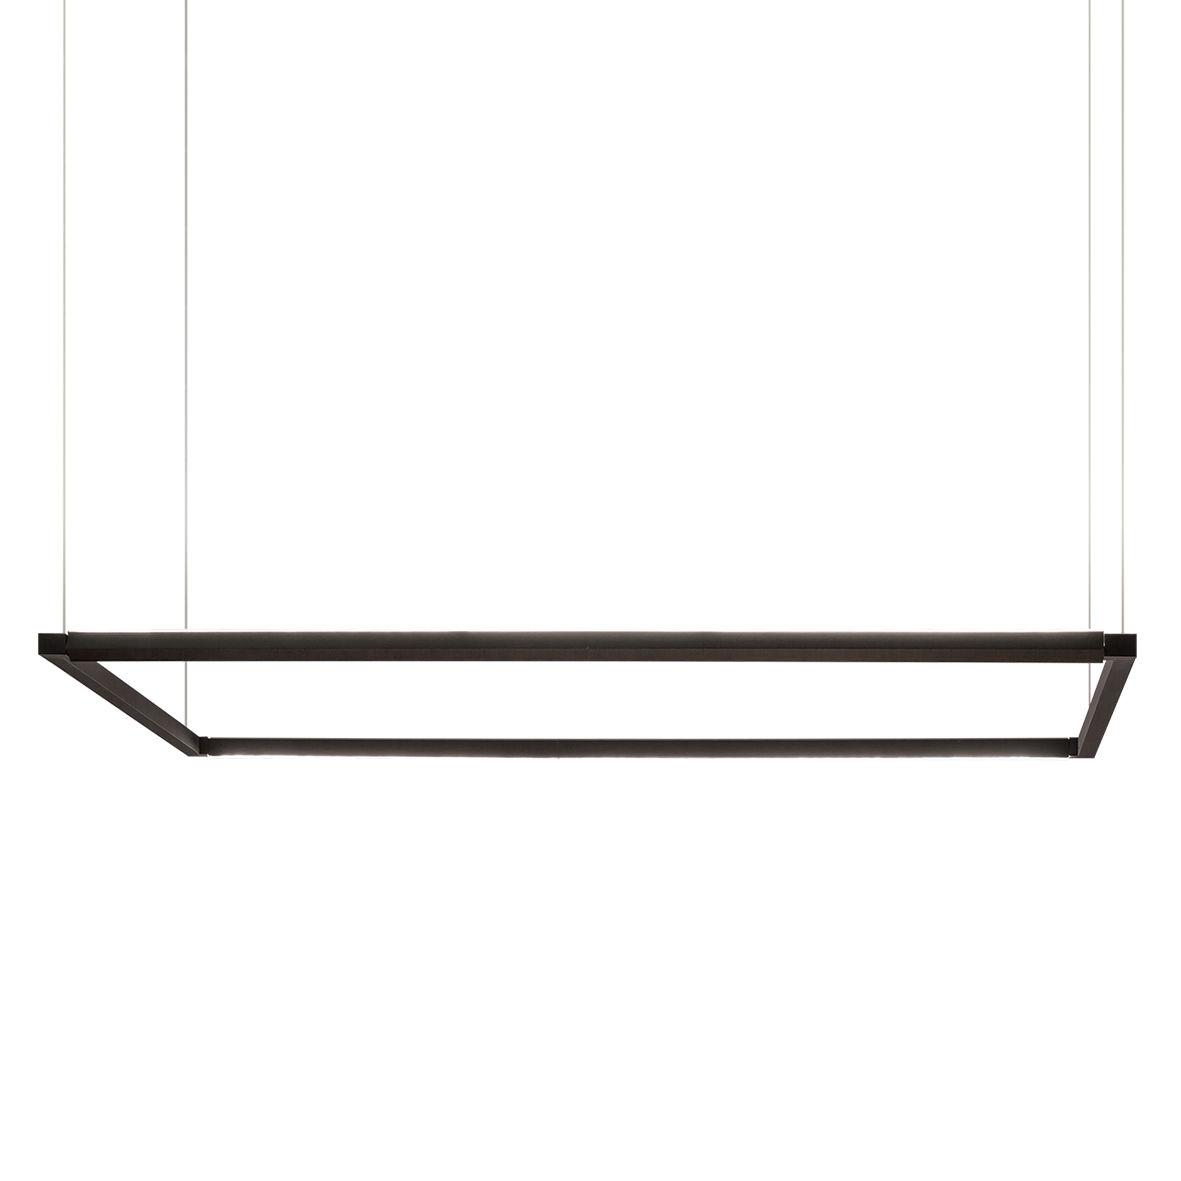 Lighting - Pendant Lighting - Spigolo Horizontal LED Pendant - / 114 x 58 cm - Adjustable light by Nemo - Black - Extruded aluminium